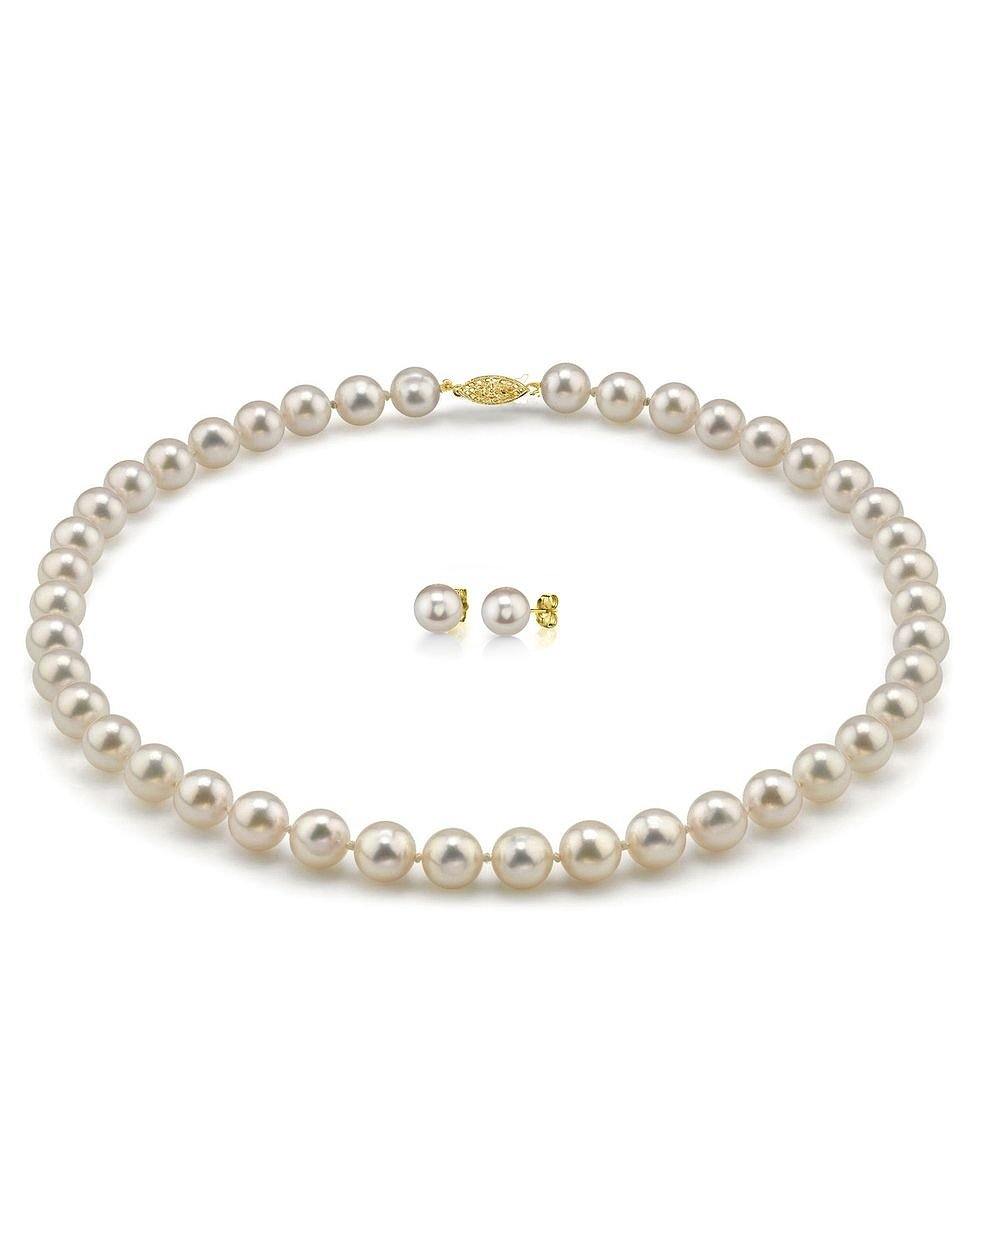 14K Gold 7.5-8.0mm Hanadama Japanese Akoya White Cultured Pearl Necklace & Earrings Set, 18'' Length